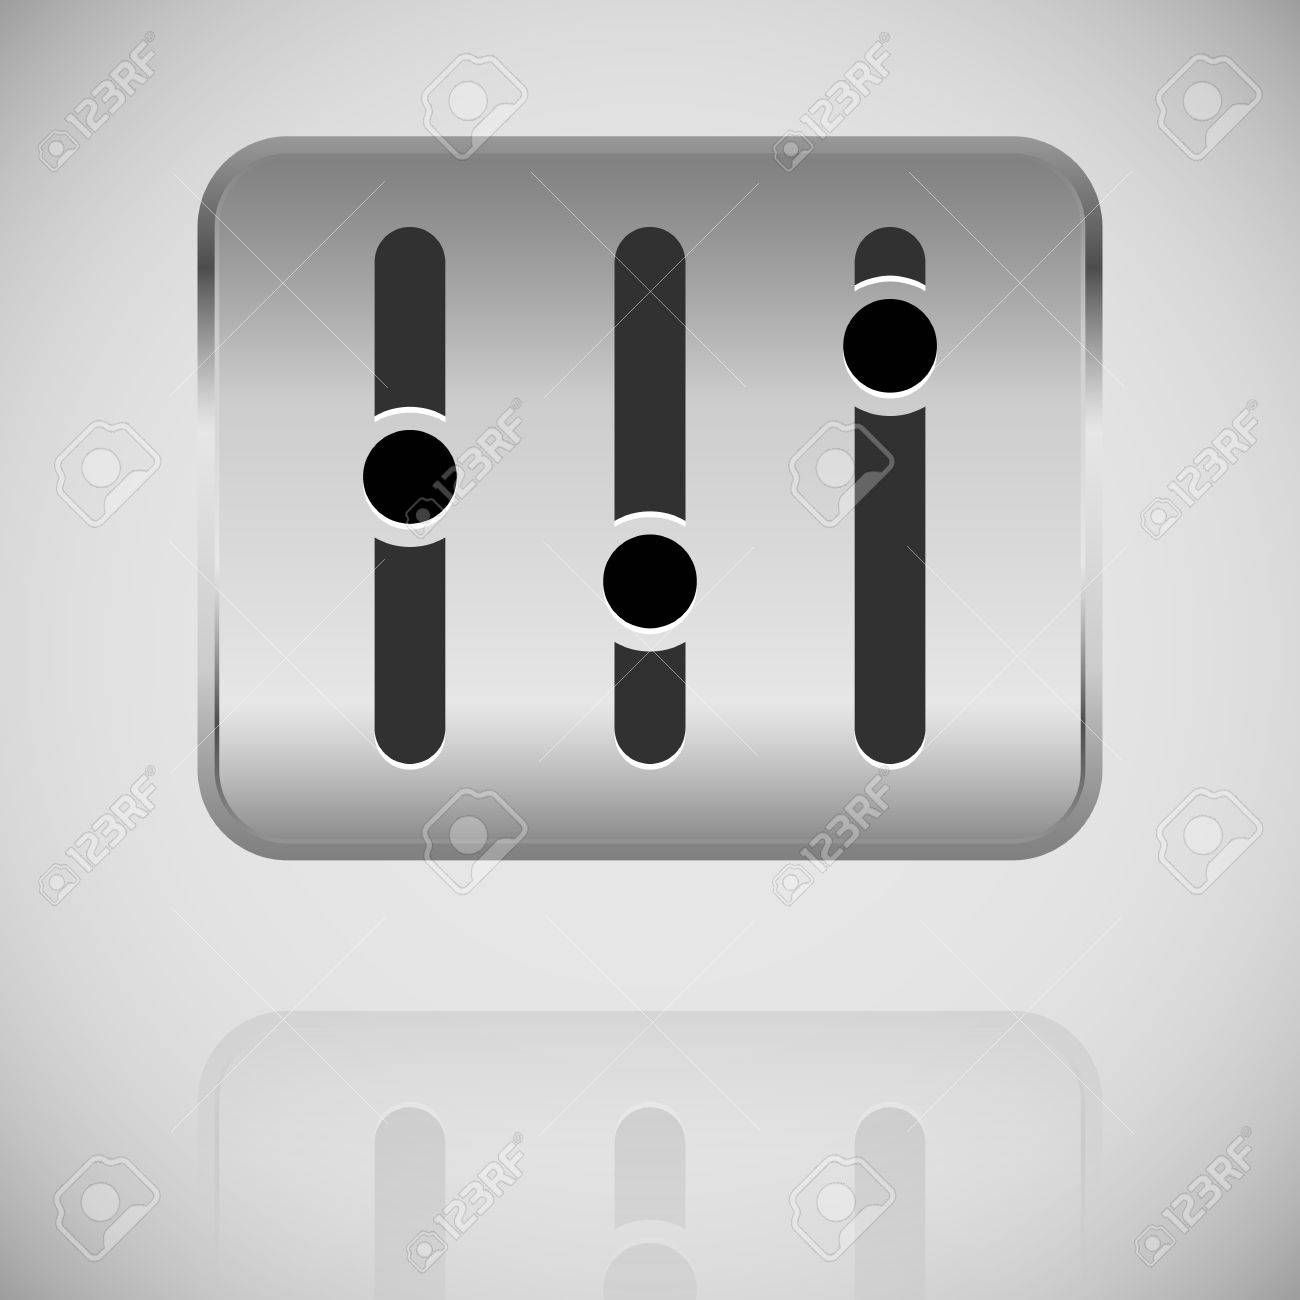 Dorable Potentiometer Symbols Photo - Wiring Diagram Ideas ...